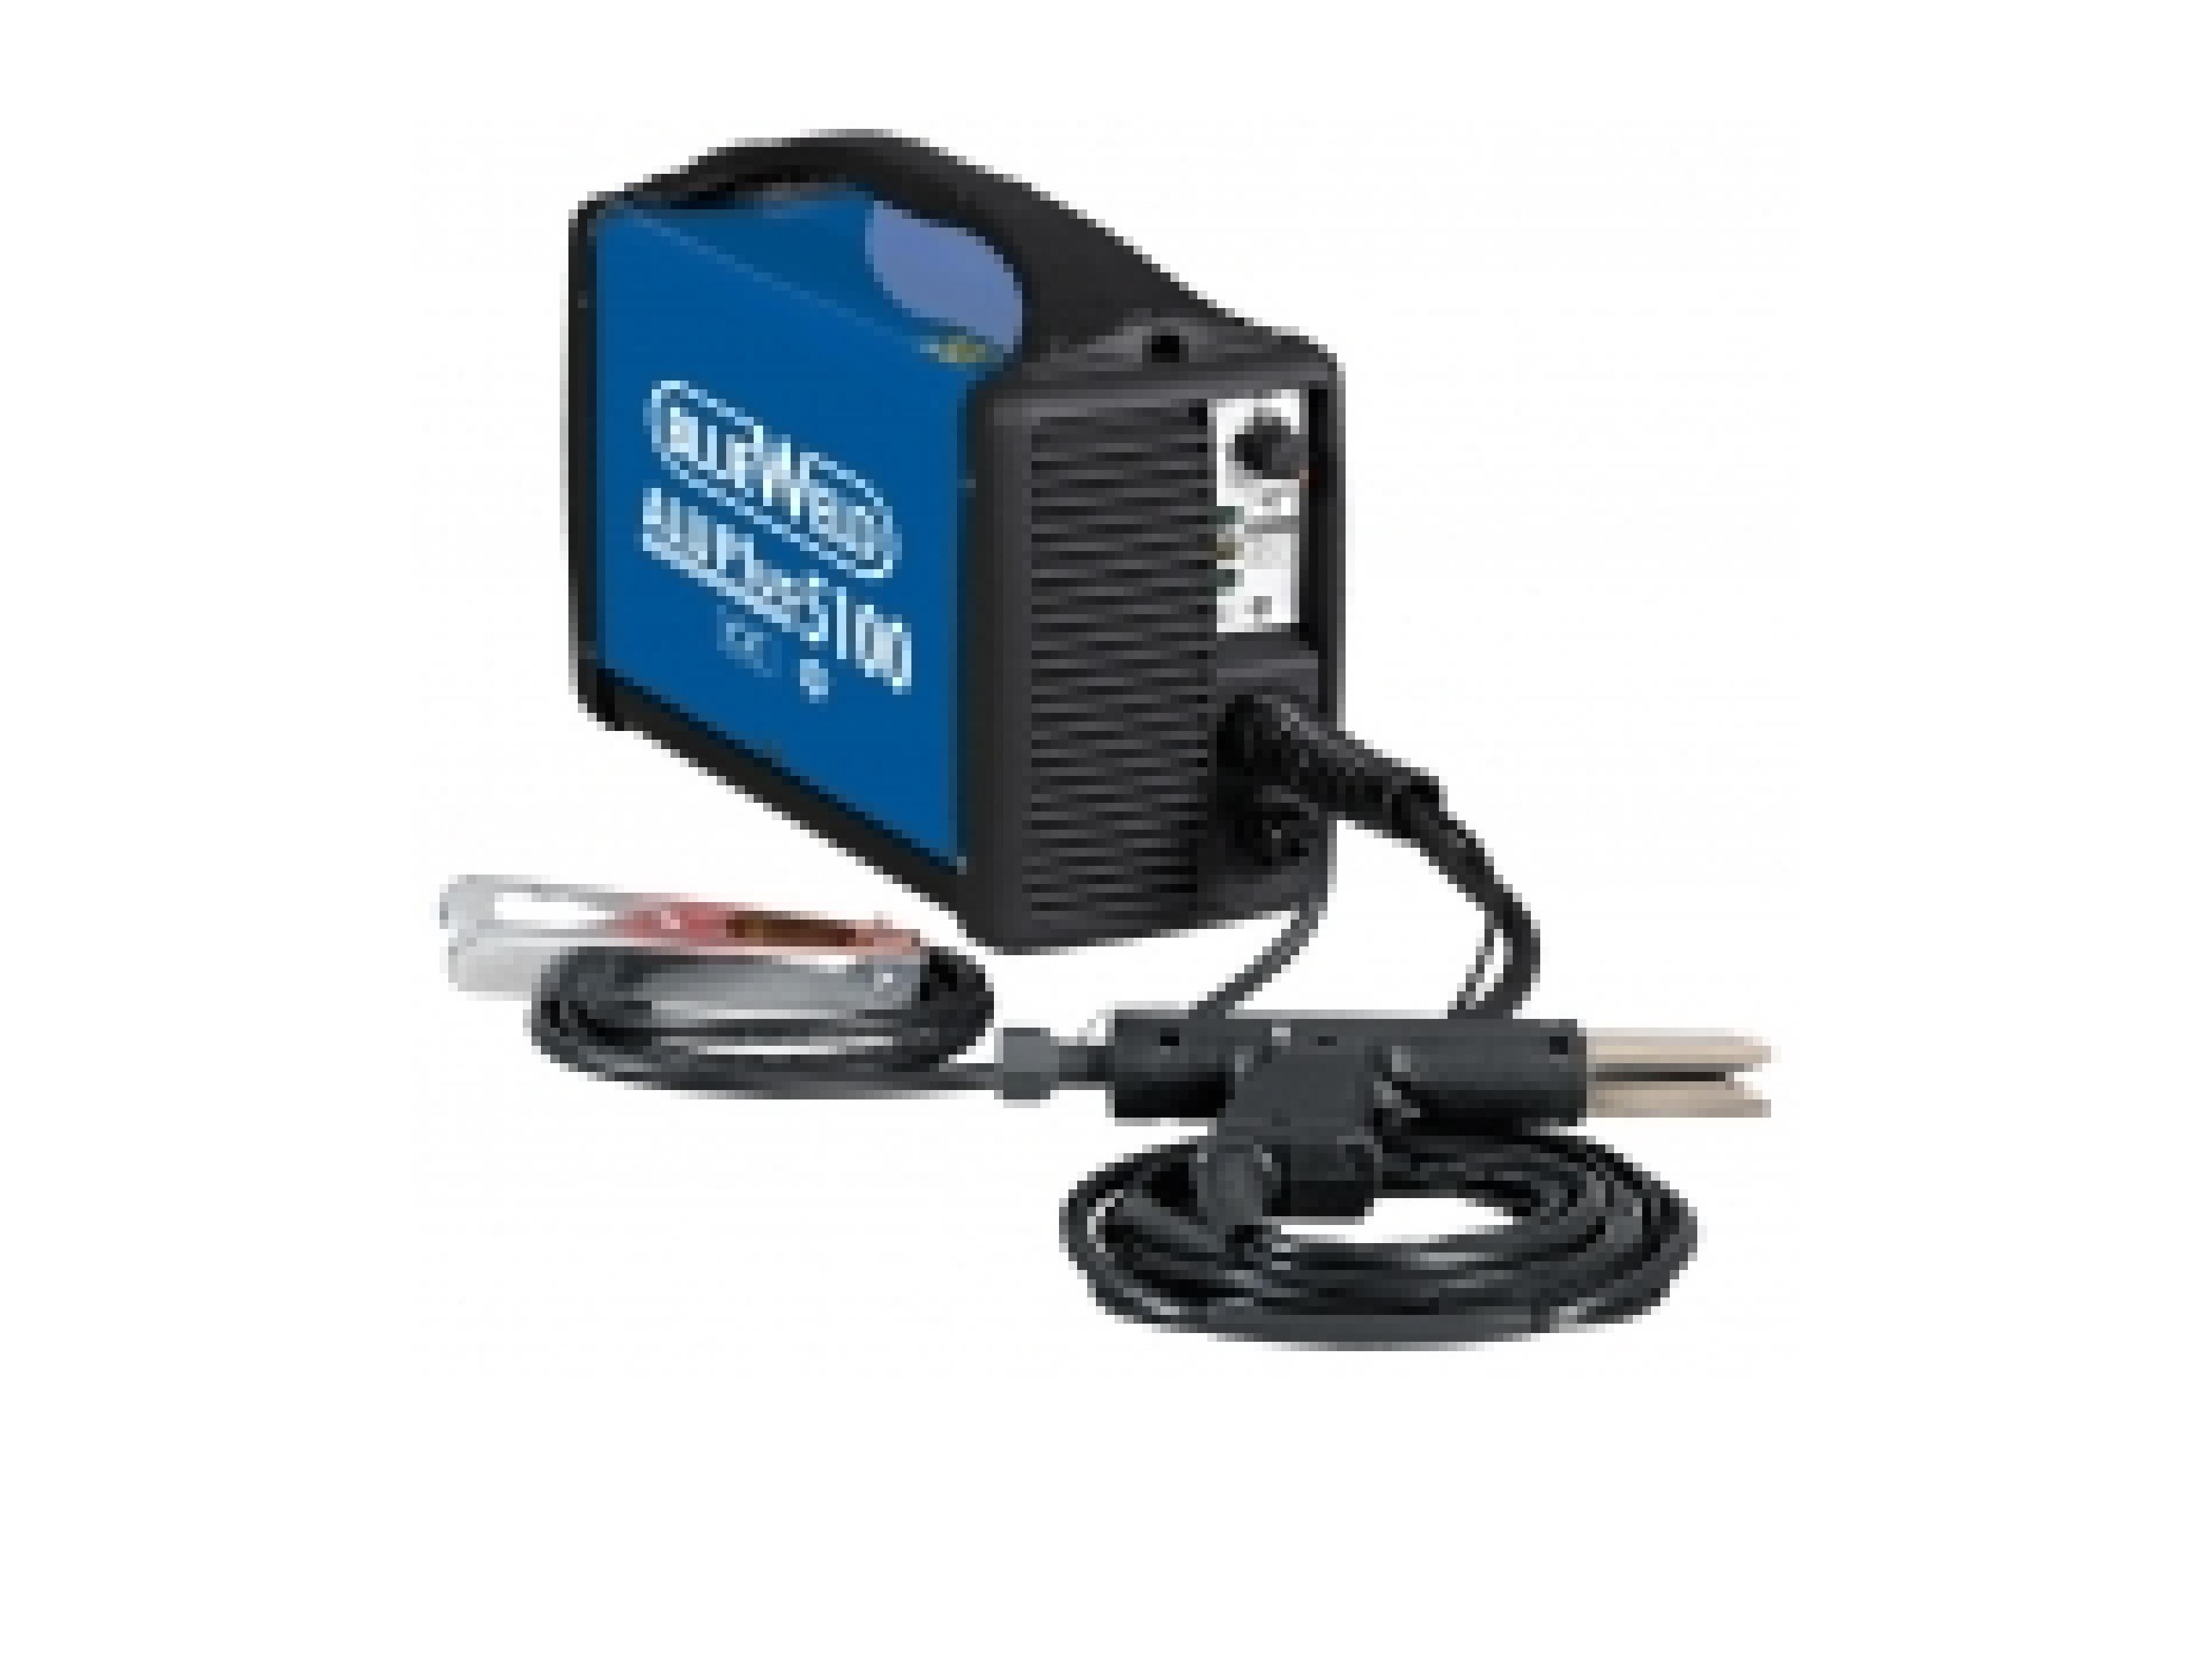 Аппарат контактной сварки BlueWeld Aluplus 5100